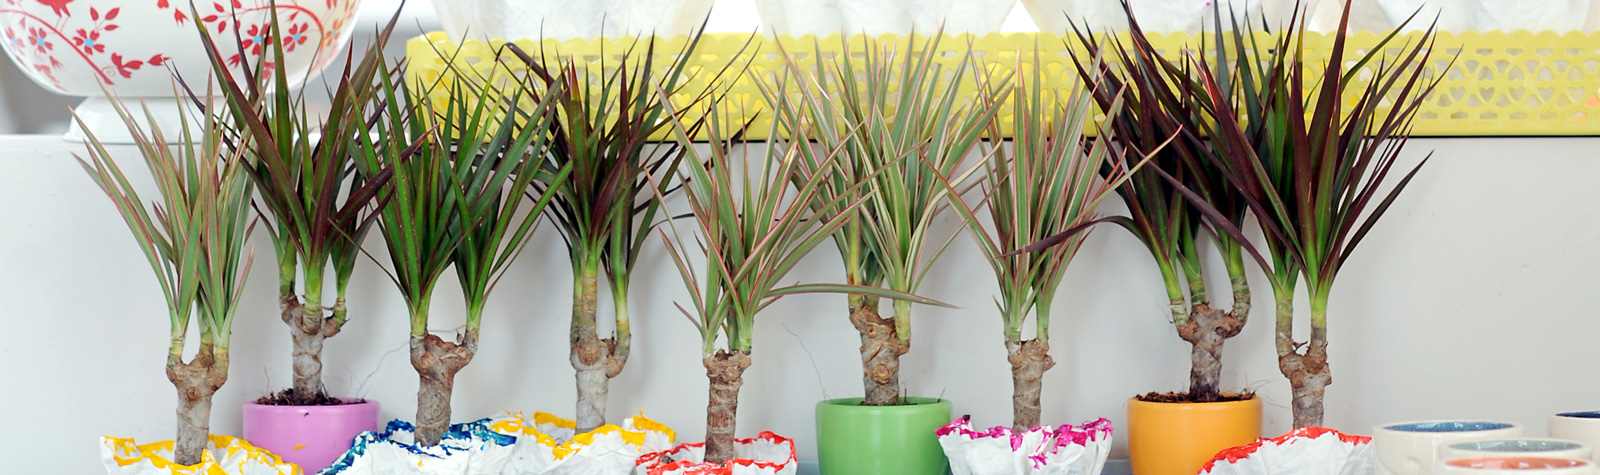 Plantas exterior sombra maceta top plantas exterior for Plantas de exterior